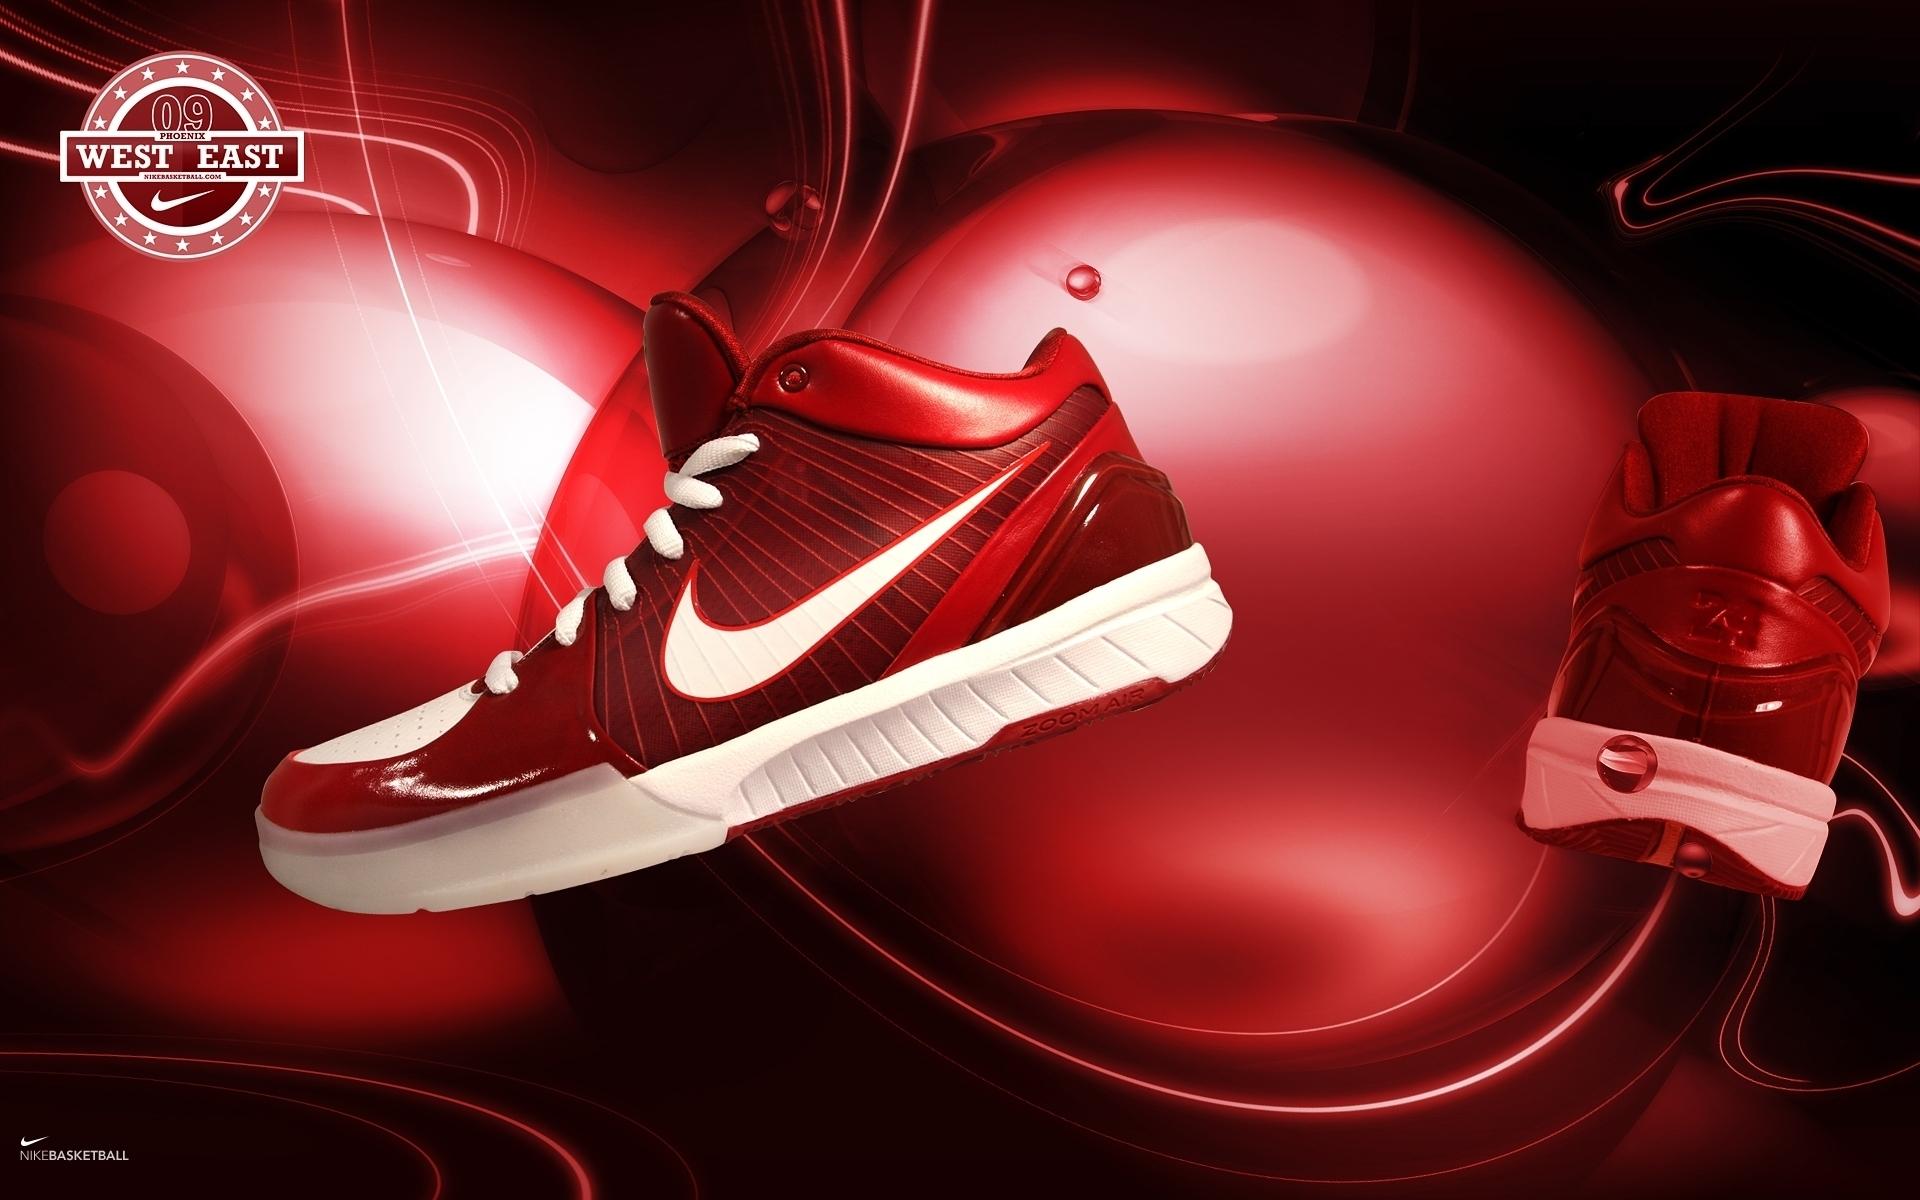 Nike Wallpaper Nba: Basketball Wallpapers, Photos And Desktop Backgrounds Up